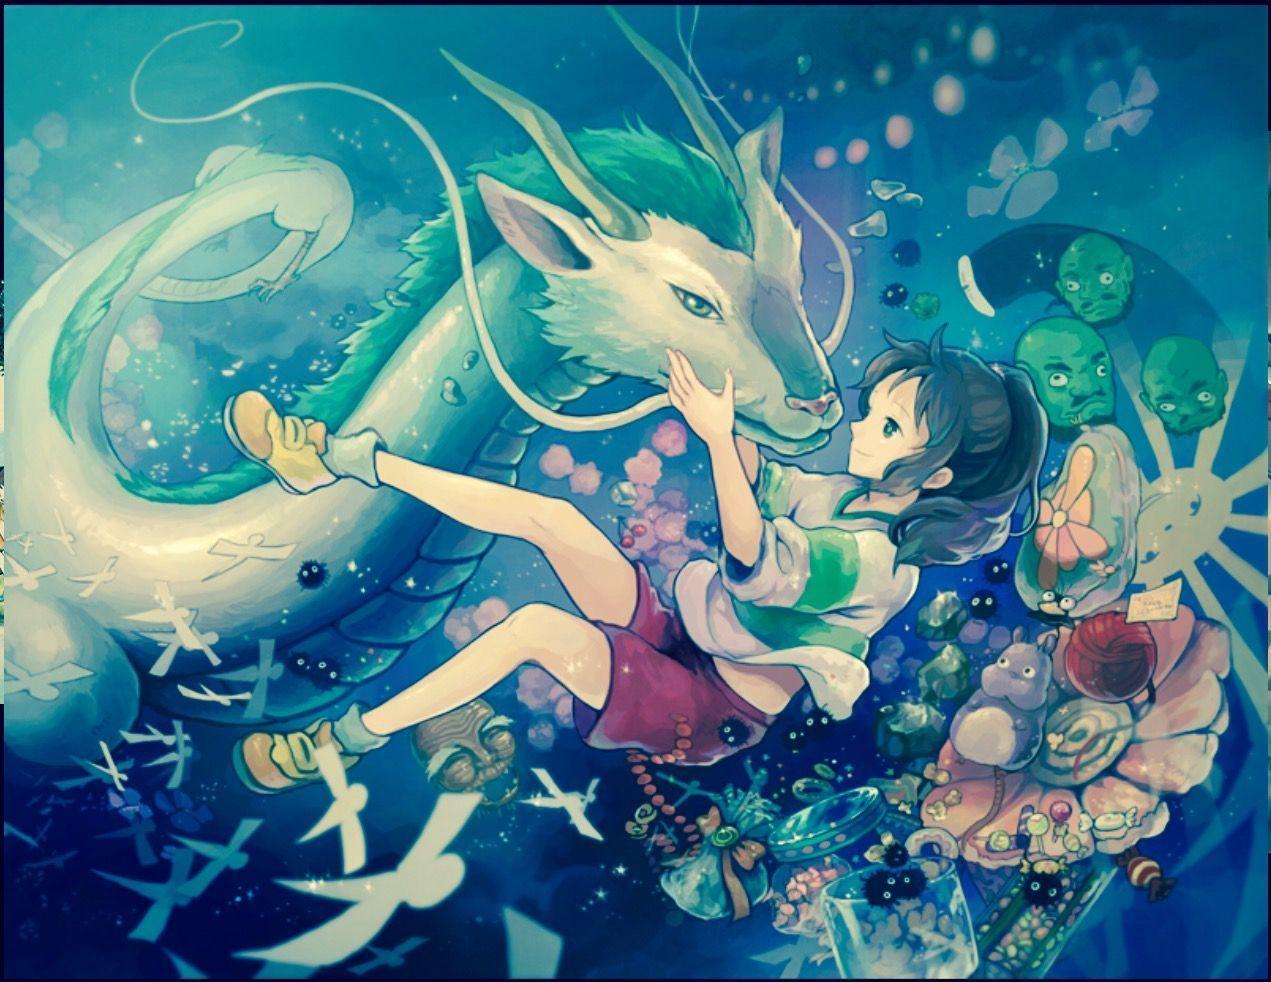 Haku Spirited Away Wallpapers Top Free Haku Spirited Away Backgrounds Wallpaperaccess